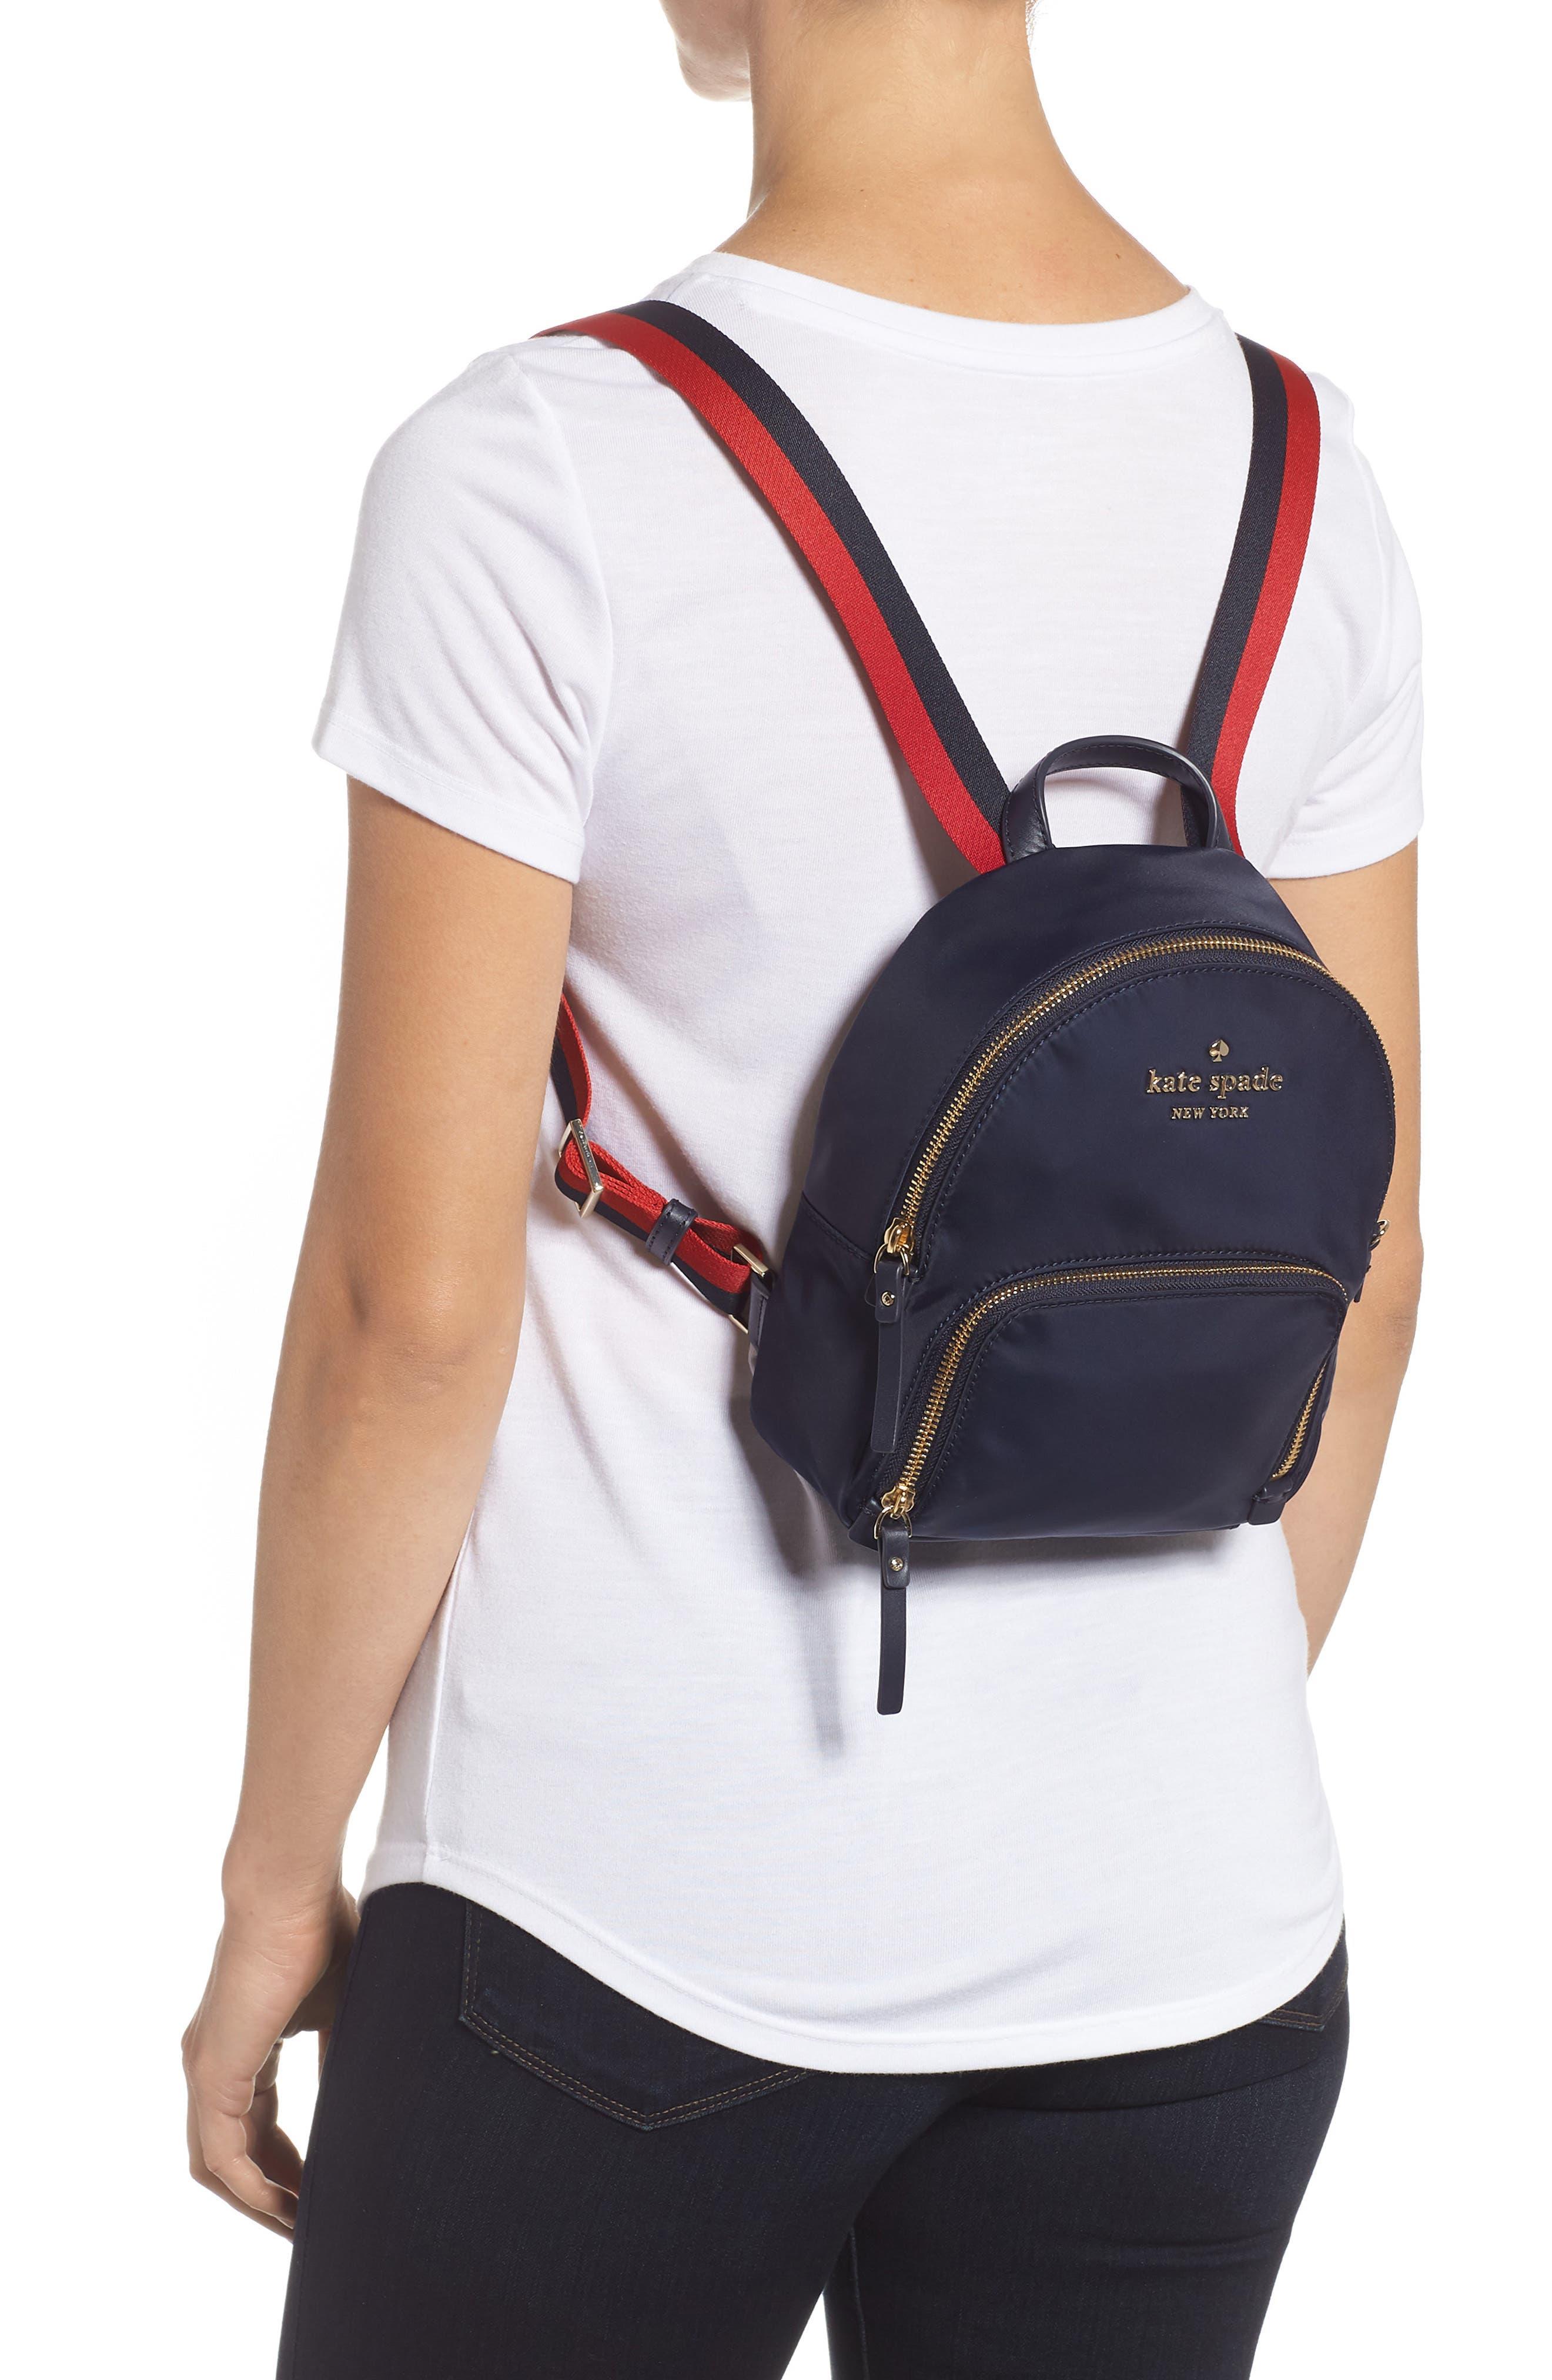 KATE SPADE NEW YORK,                             kate spade watson lane varsity stripe small backpack,                             Alternate thumbnail 2, color,                             400